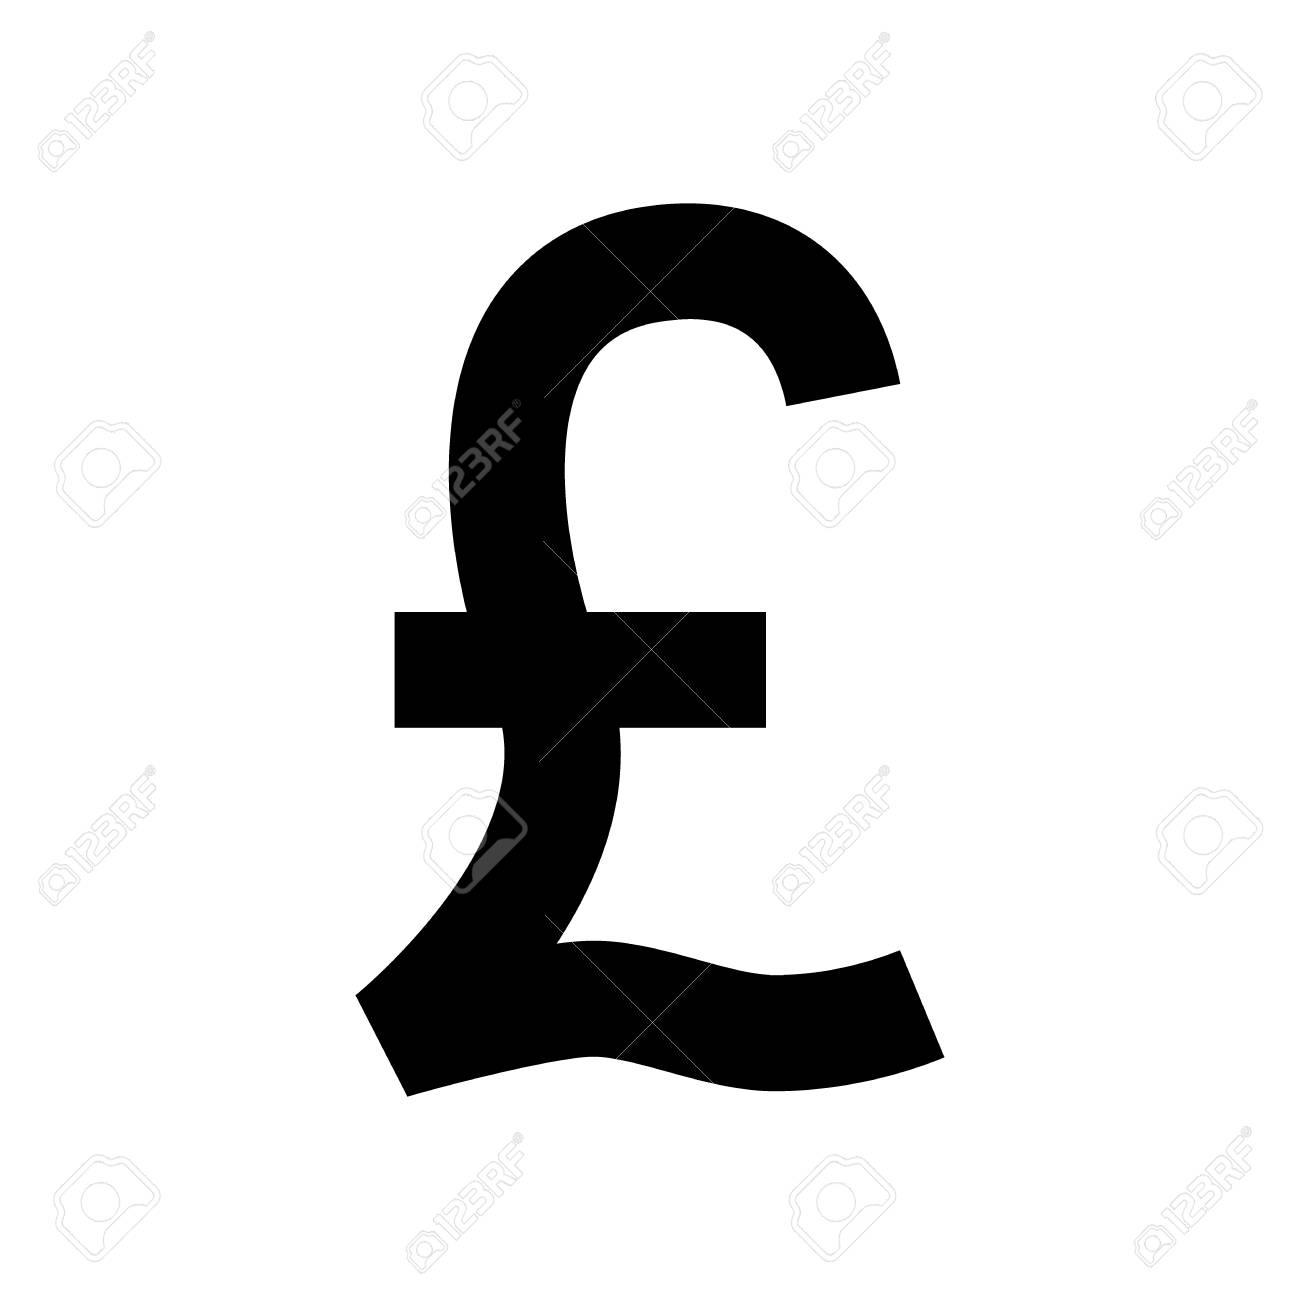 Uk Pound Currency Symbol Black Silhouette British Pound Sign